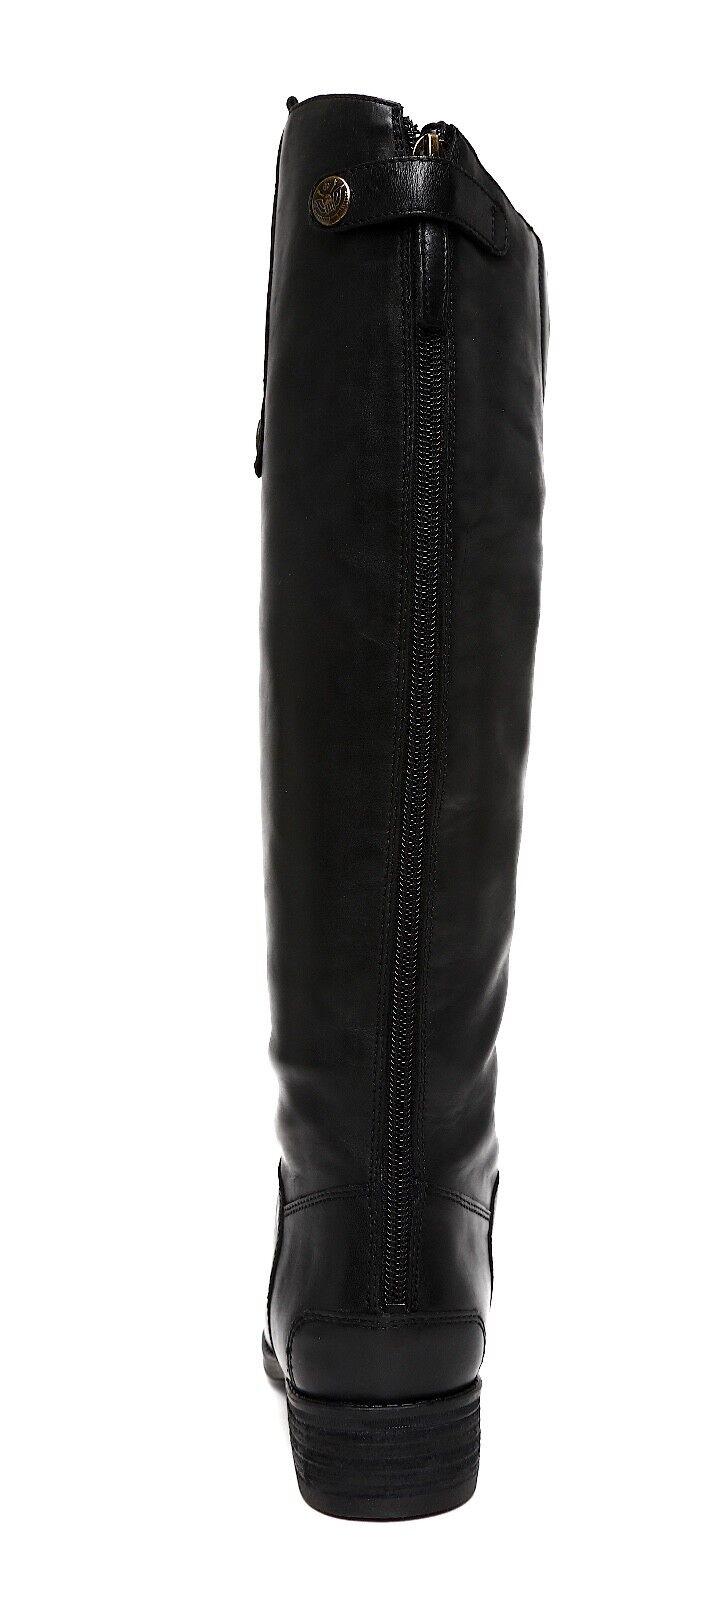 Sam Edelman Penny Penny Penny Width Leather Boot Black Women Sz 8 M 5831   bd2522